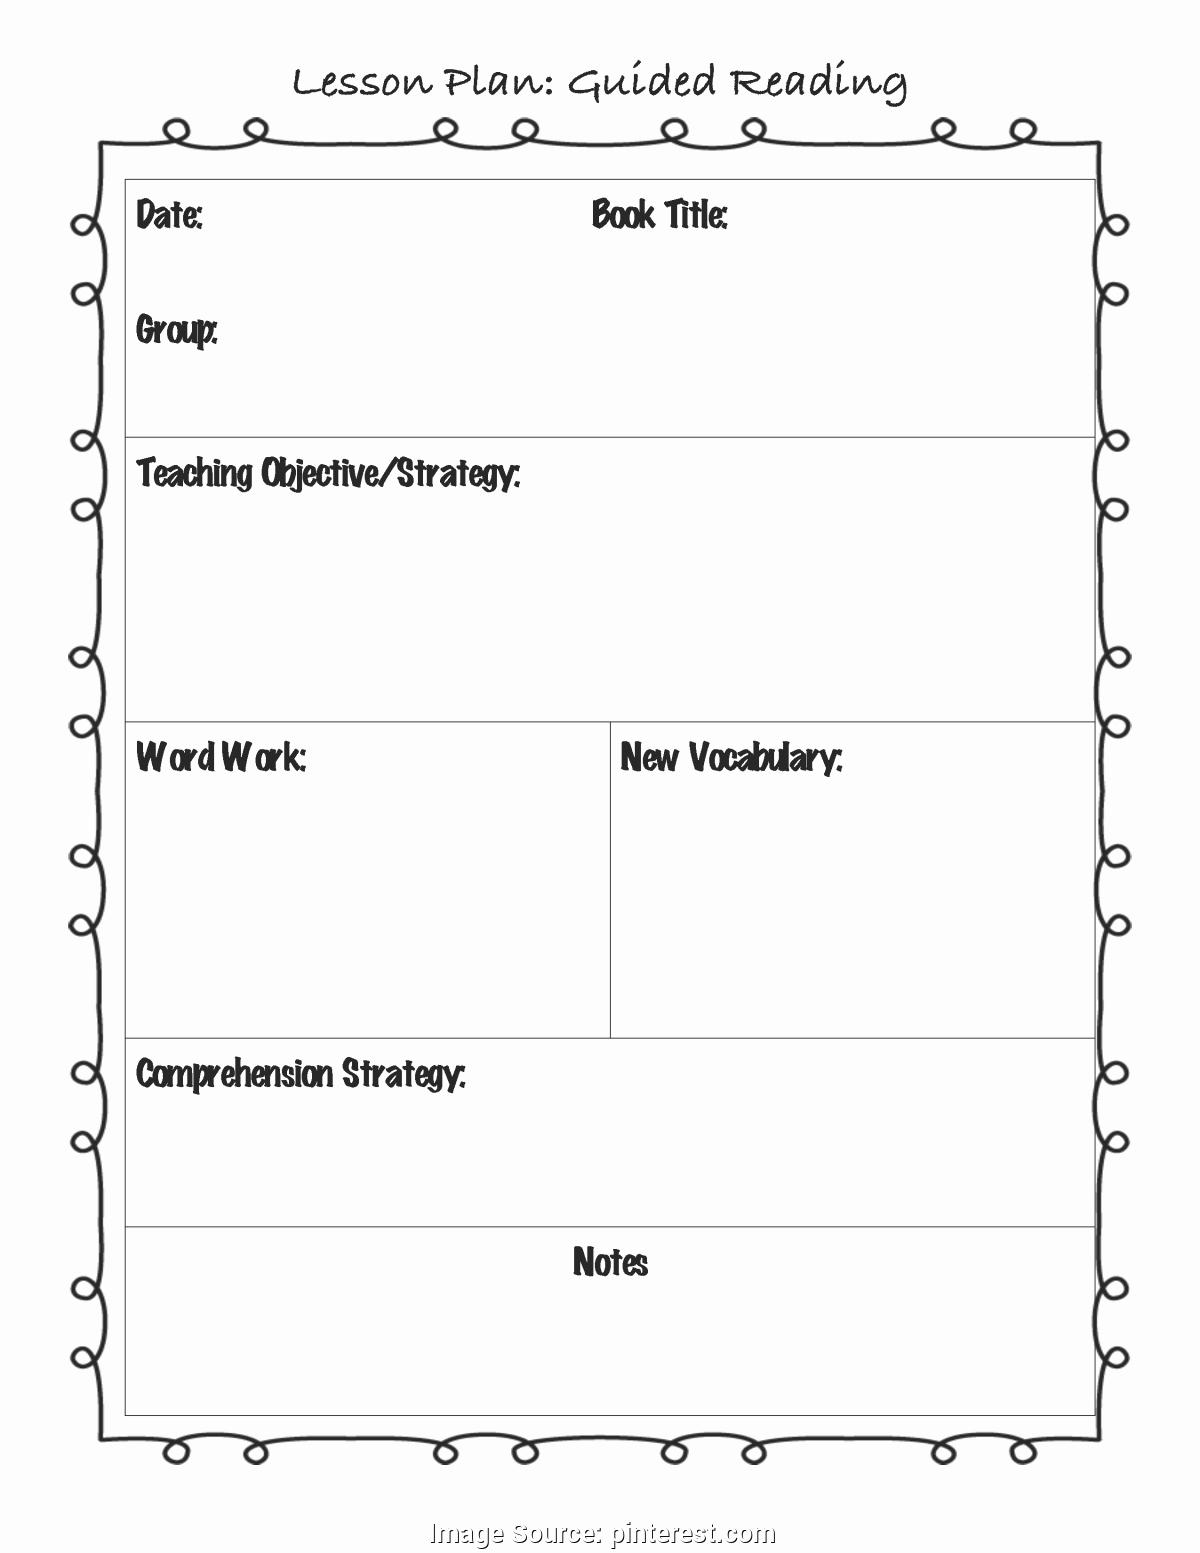 Dance Lesson Plan Template Elegant Blended Learning Lesson Plan Template Doc – Instructional